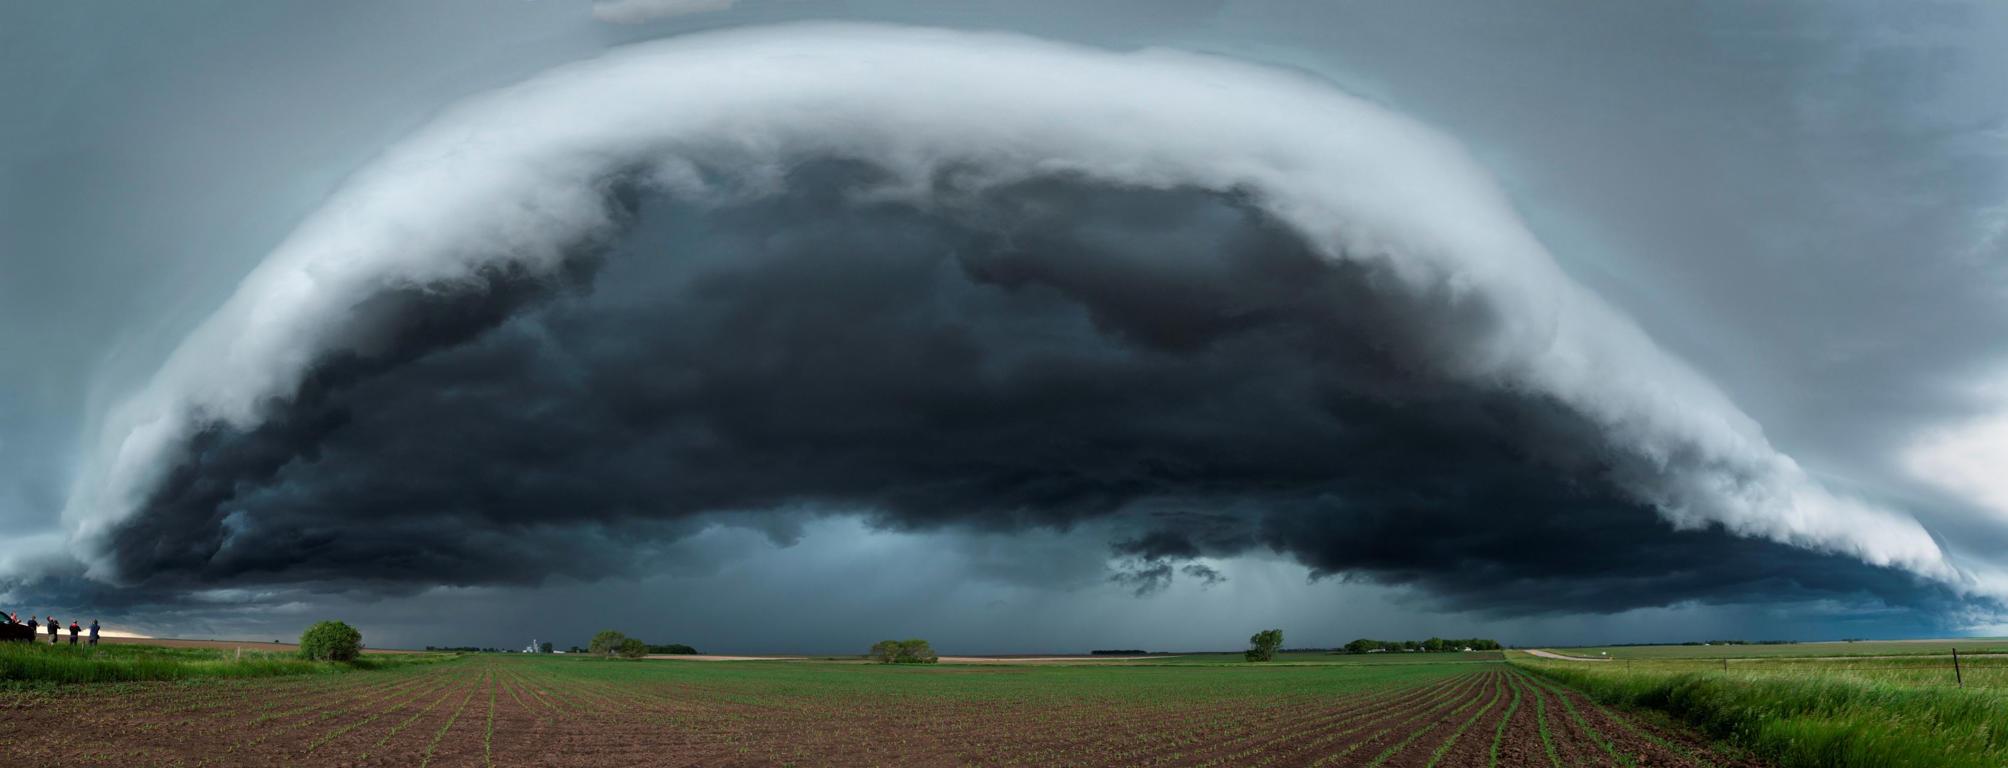 Large thunderstorm shelf cloud races over Minnesota, USA